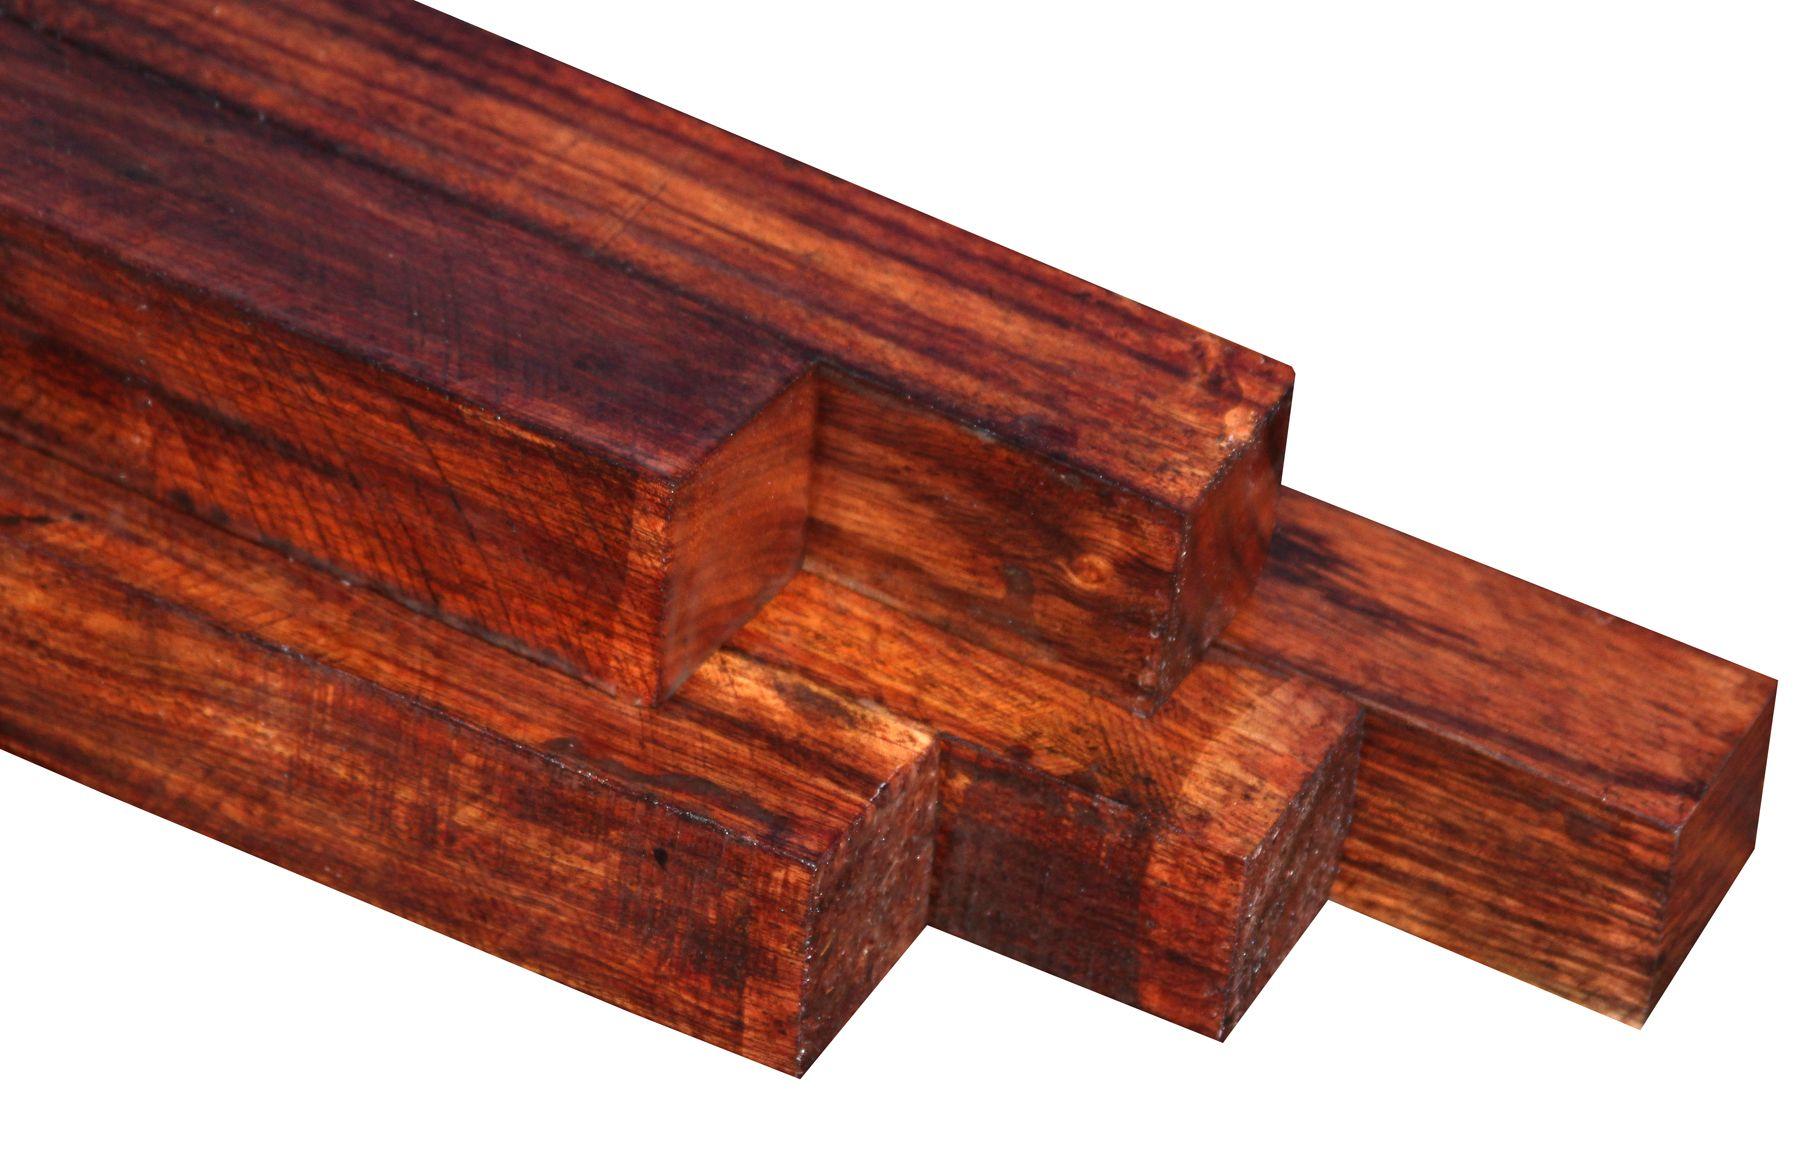 Bhilwara, Albizia odoratissma, is a medium sized hardwood